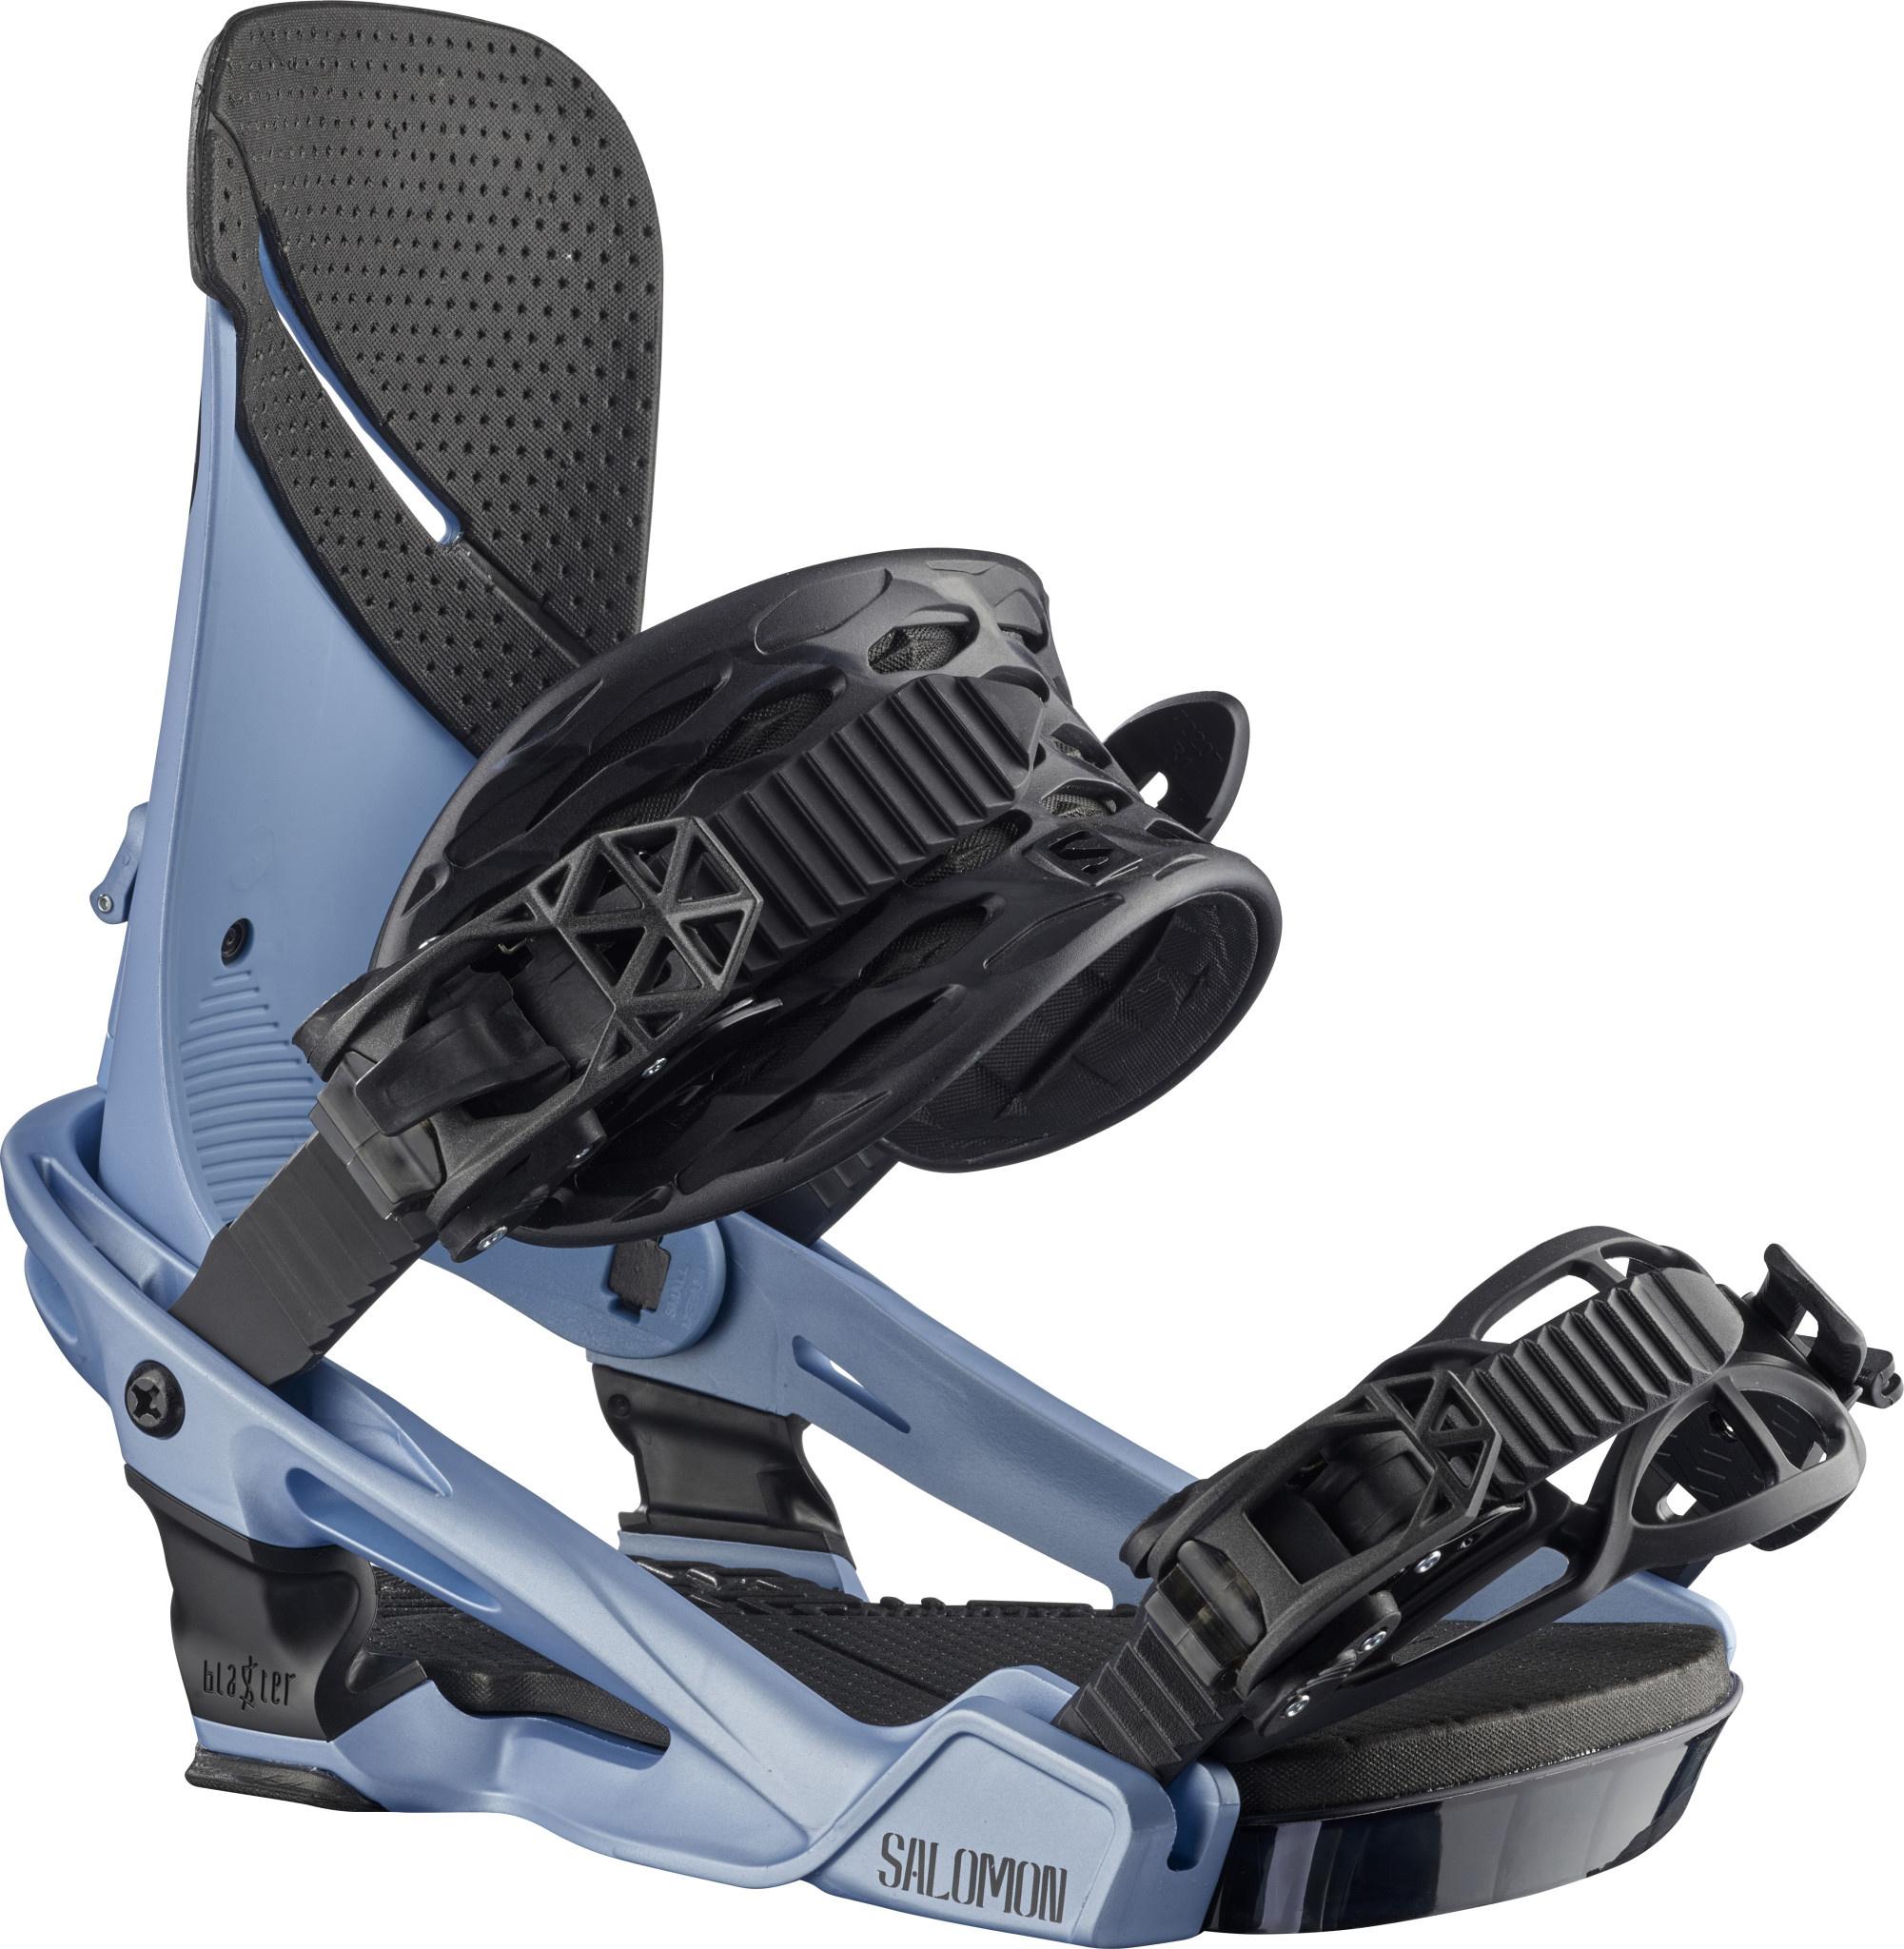 Salomon Snowboard Salomon Women's Nova Snowboard Binding (2021)